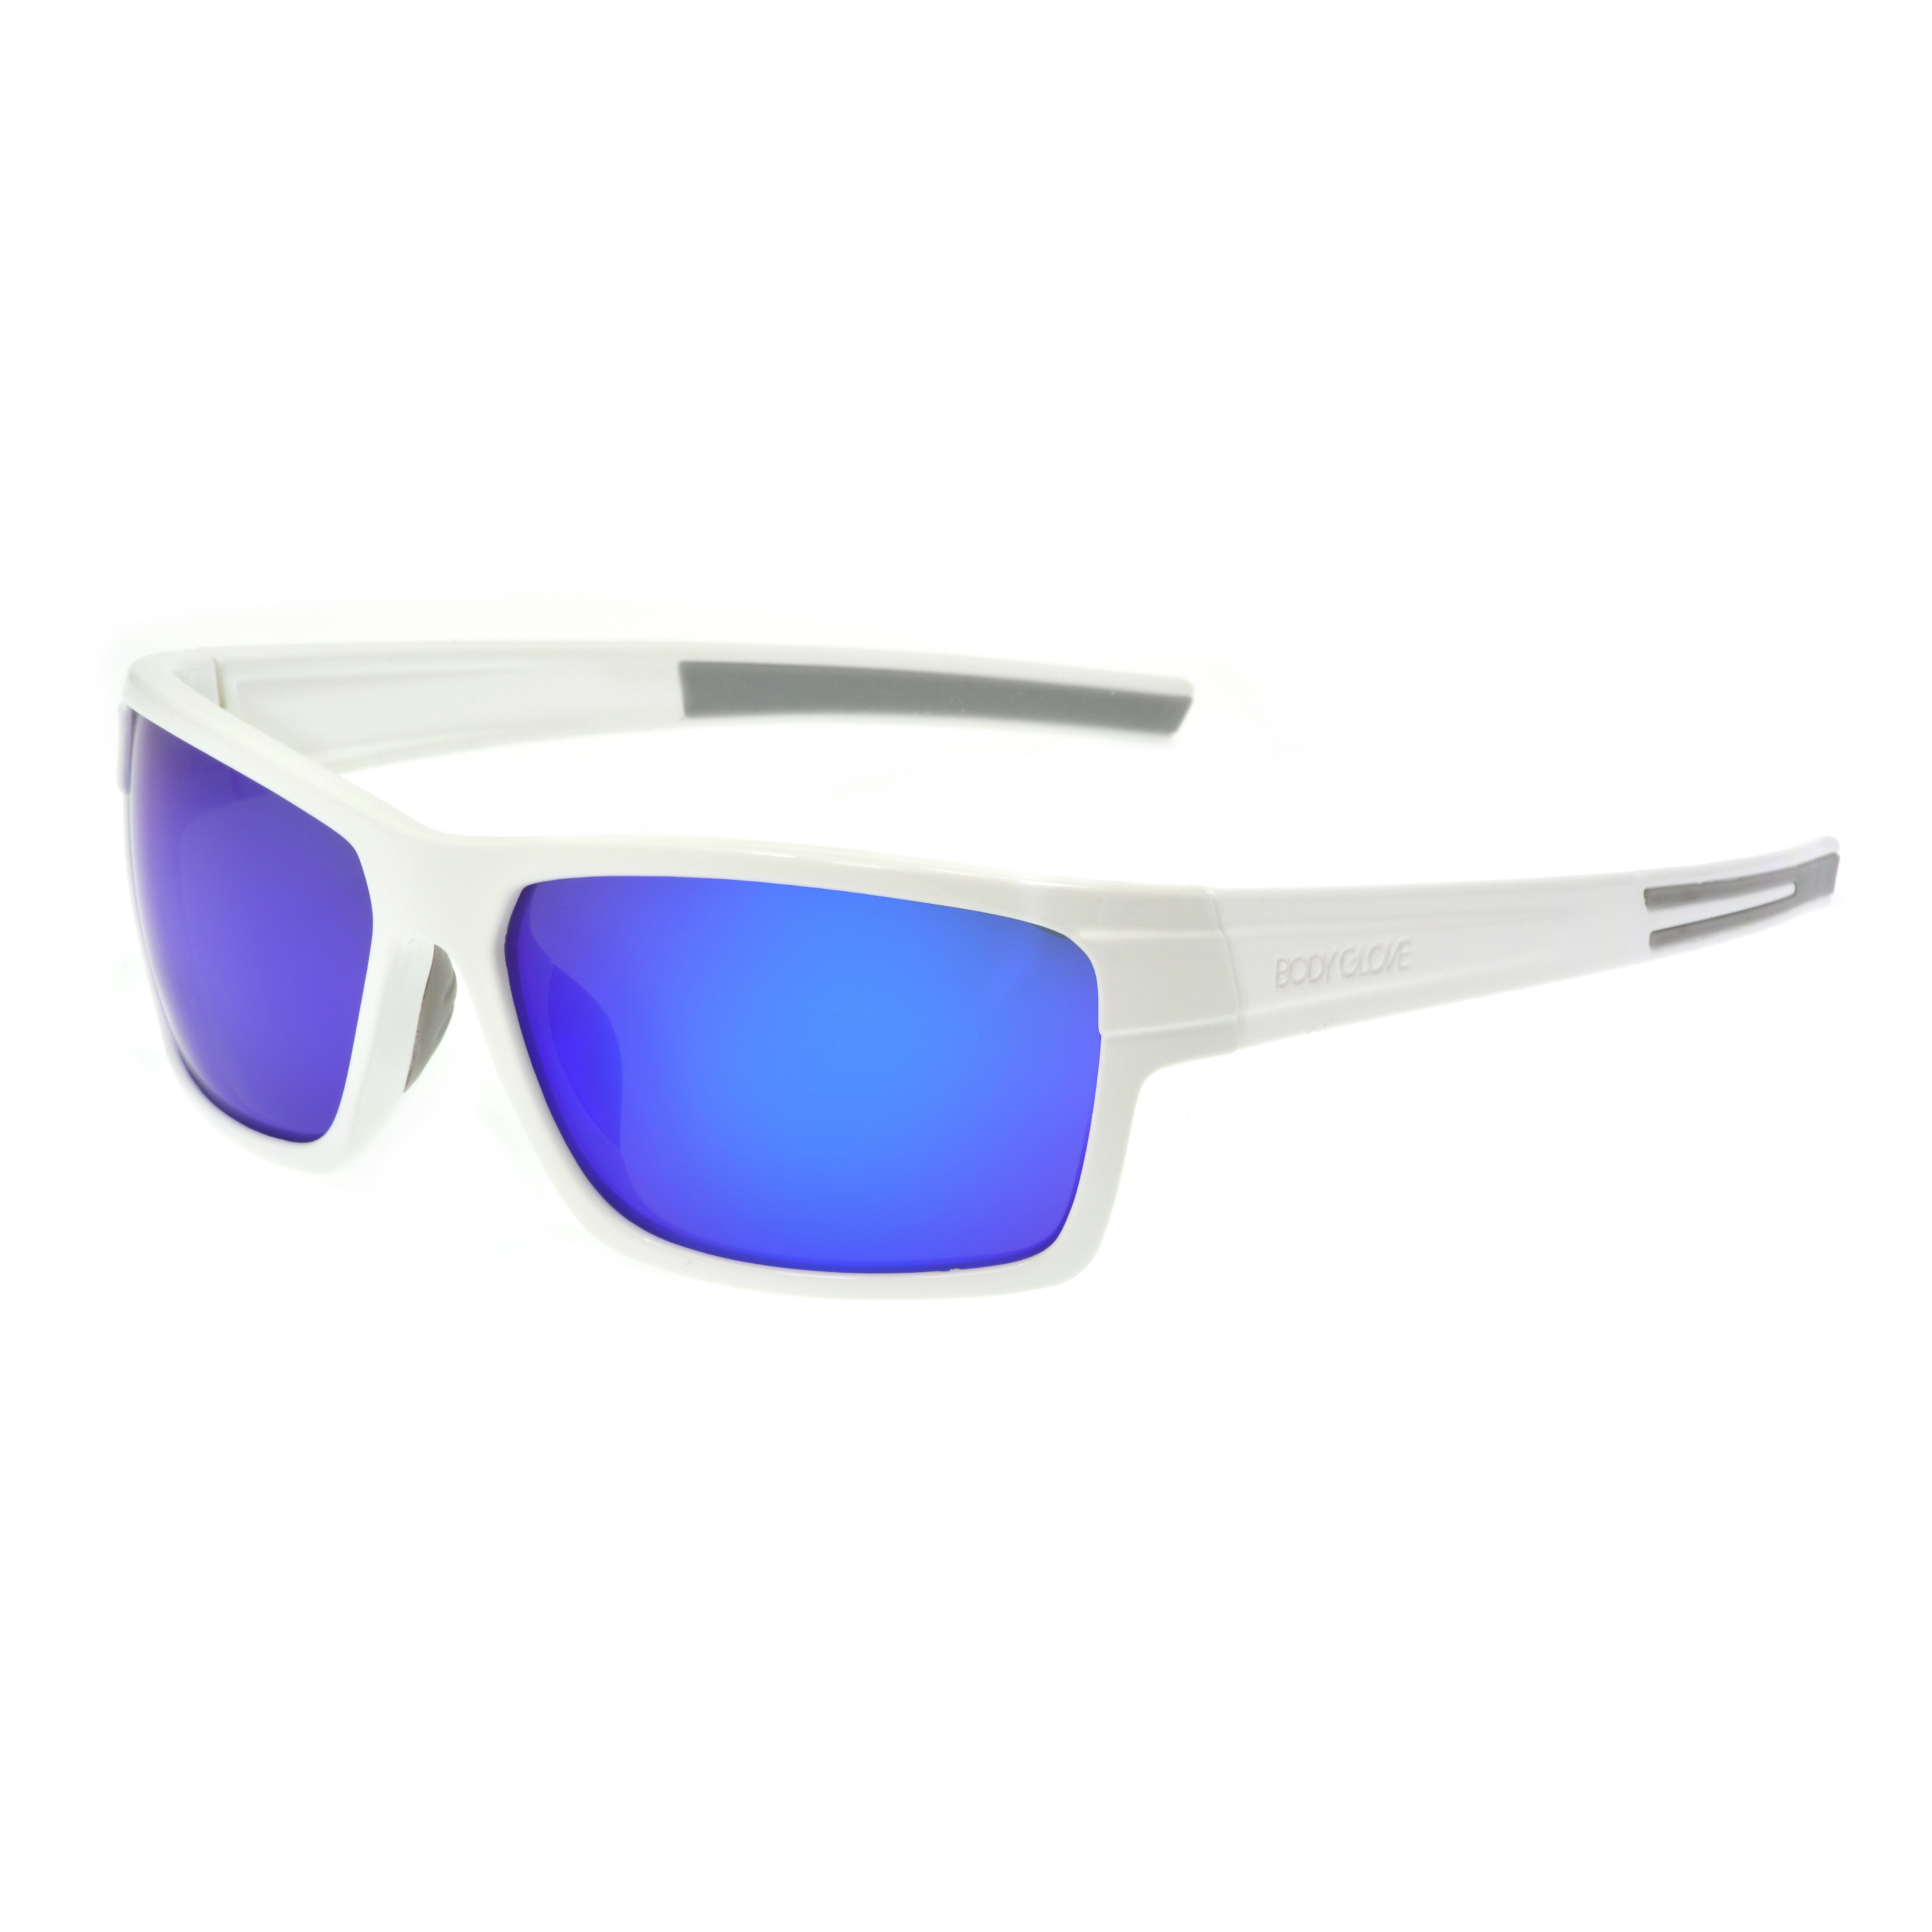 942aea51a4 Shop body glove vapor polarized sunglasses white free shipping on orders  over jpg 3400x3400 Body glove